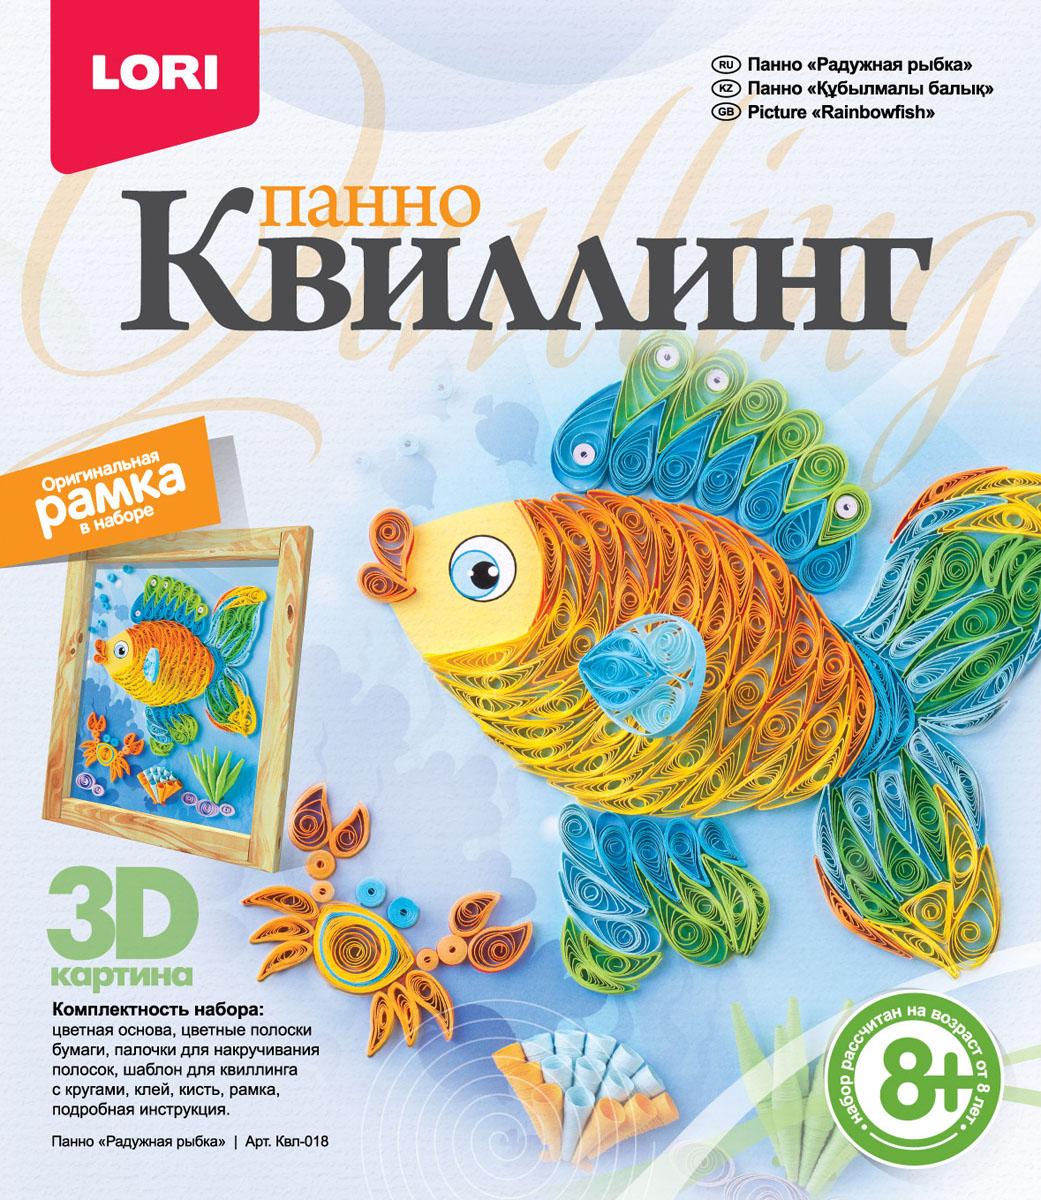 Zakazat.ru Lori Набор для квиллинга Панно Радужная рыбка